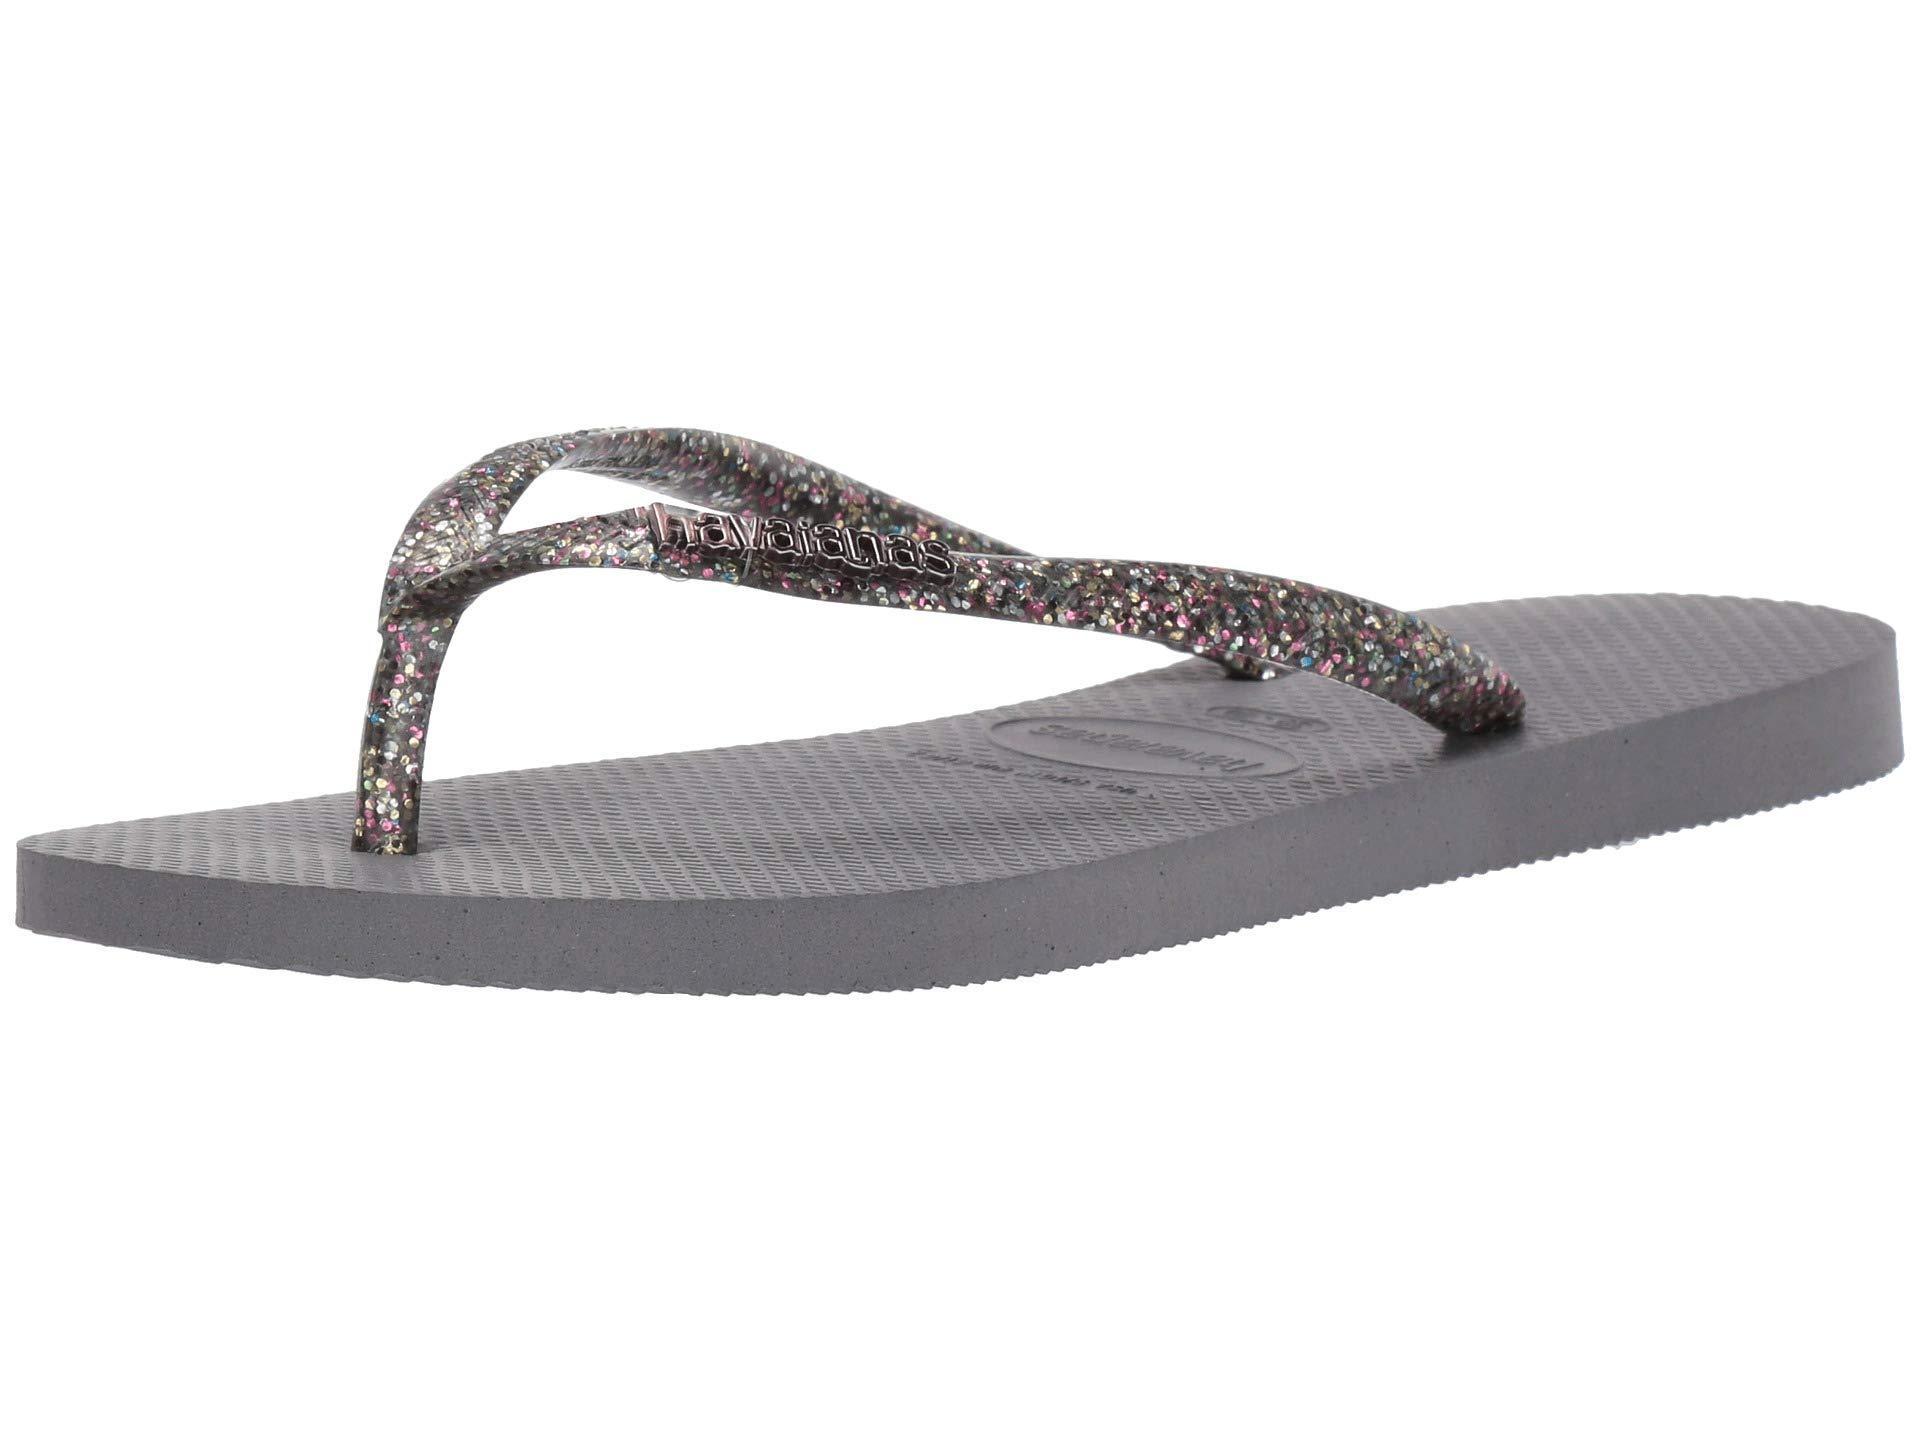 e73c61a8ef65 Havaianas - Gray Slim Logo Metallic Flip Flops (white silver silver)  Women s. View fullscreen